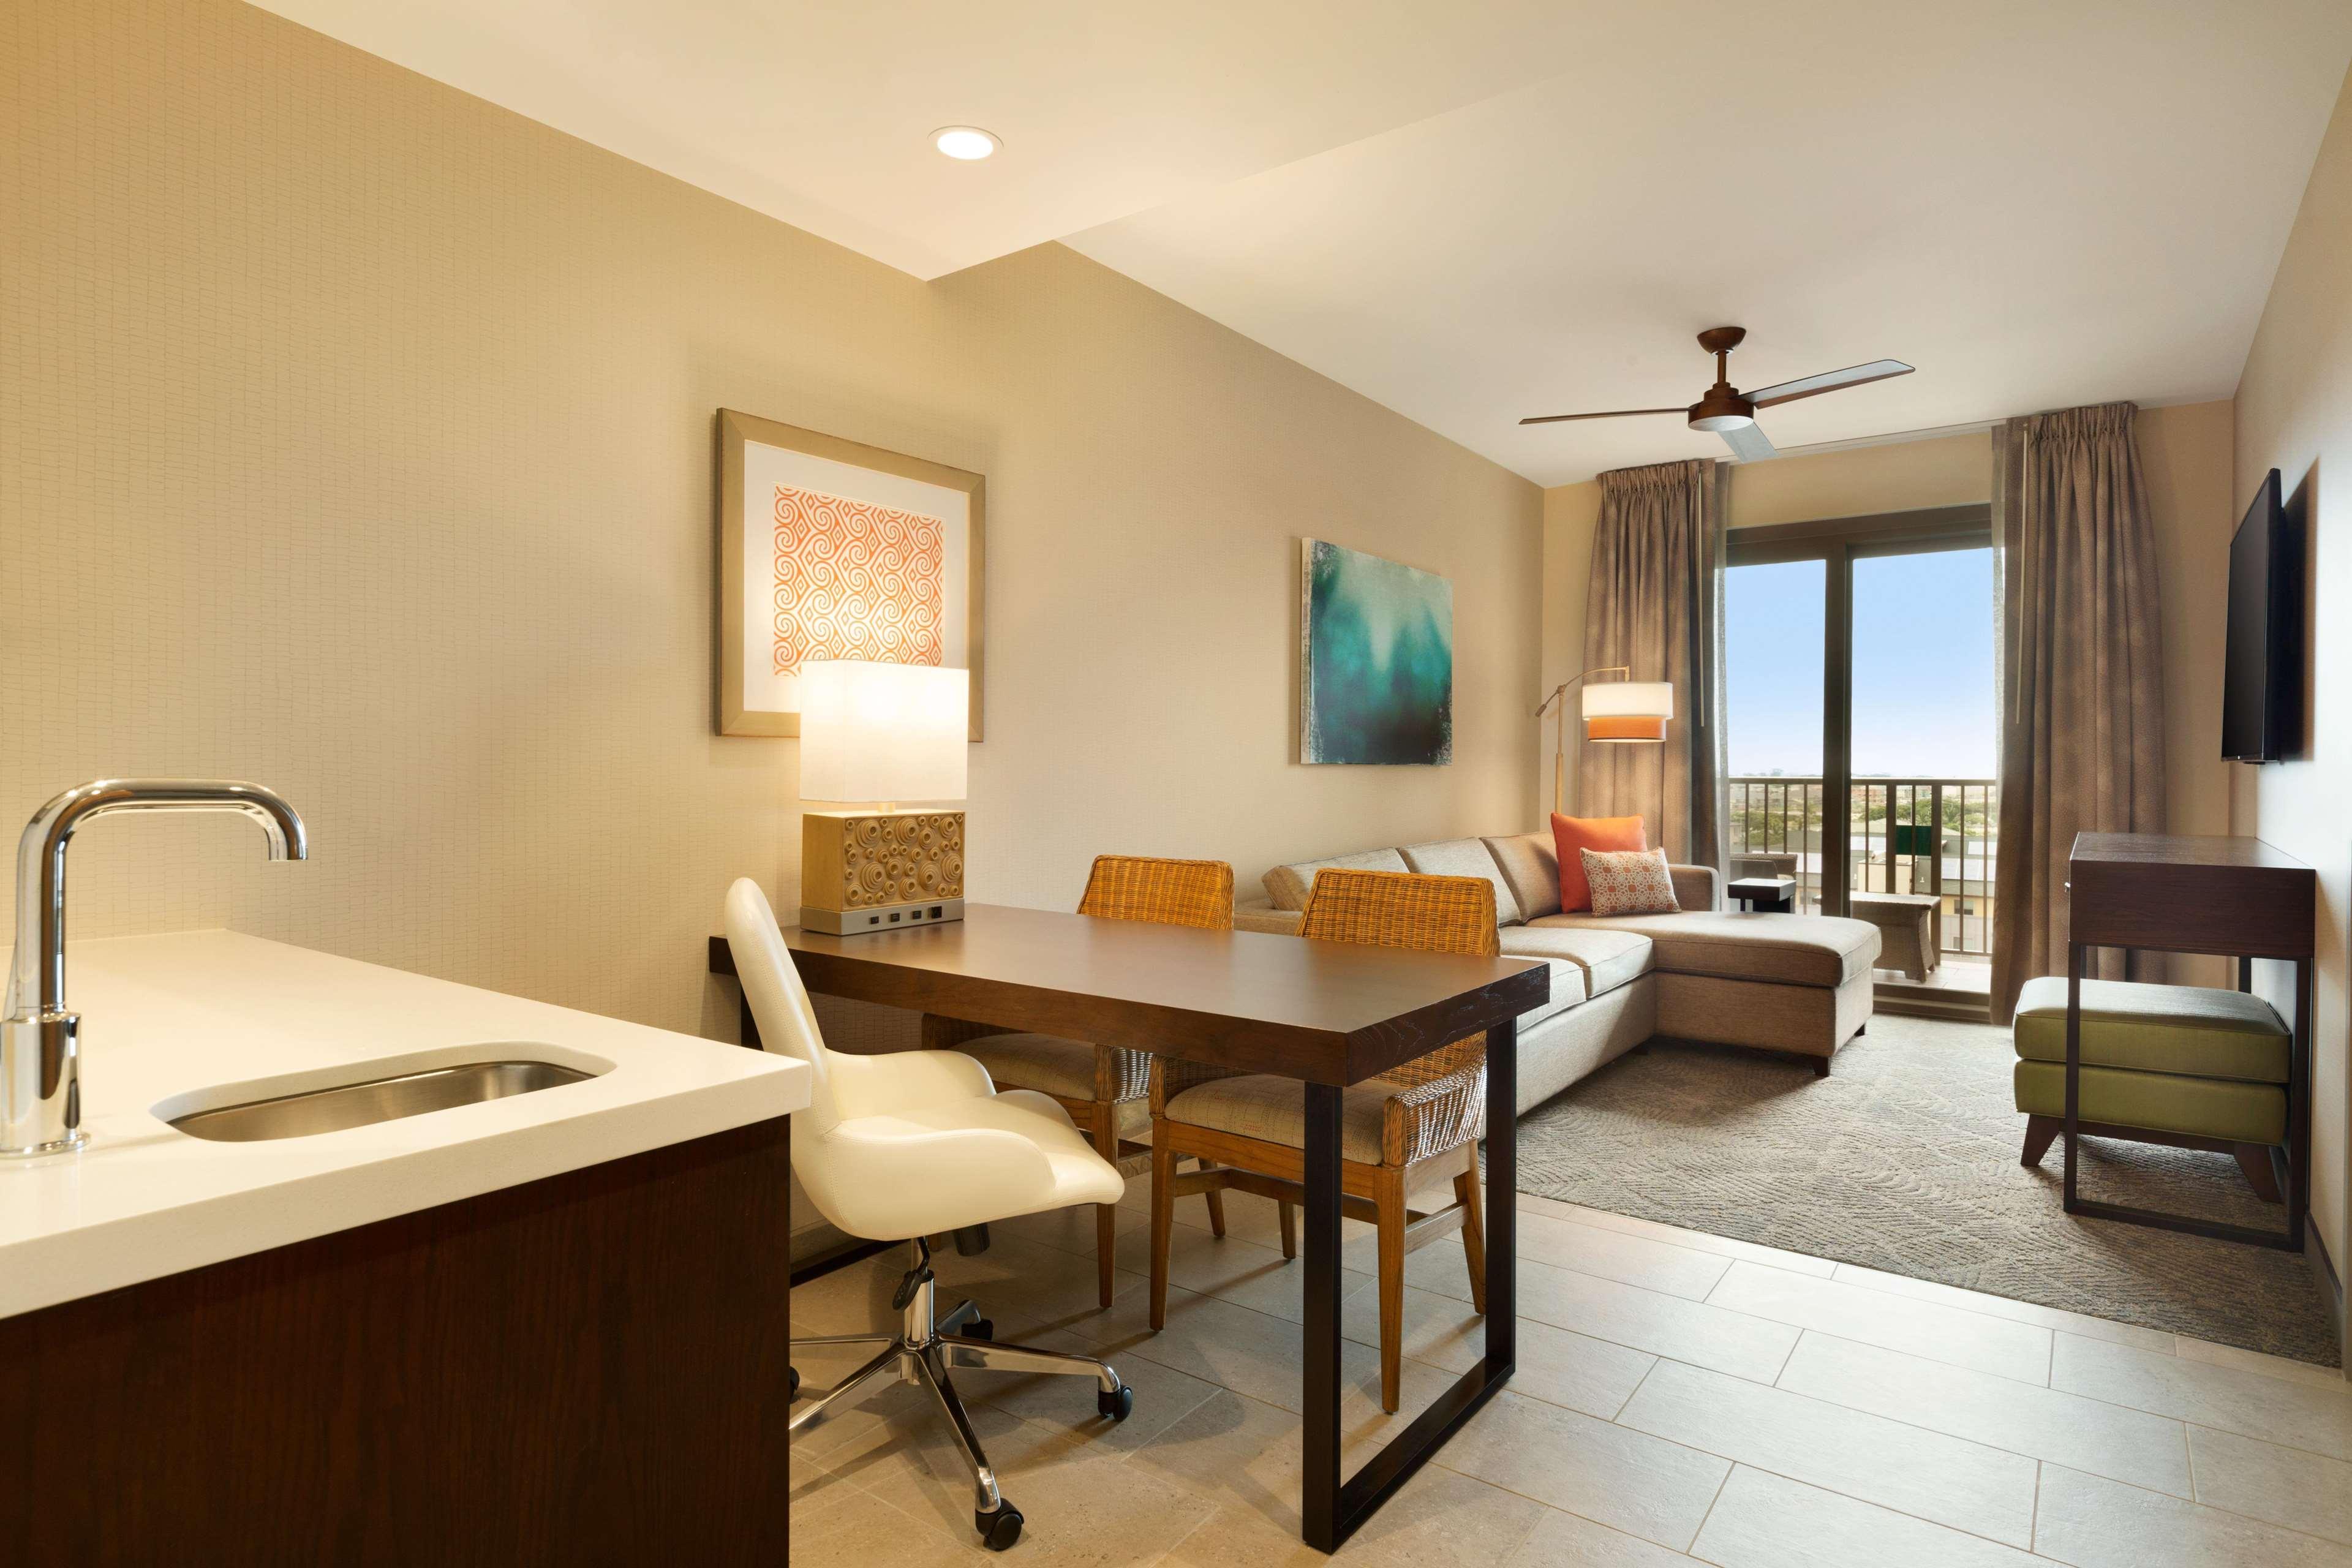 Embassy Suites by Hilton Oahu Kapolei image 39